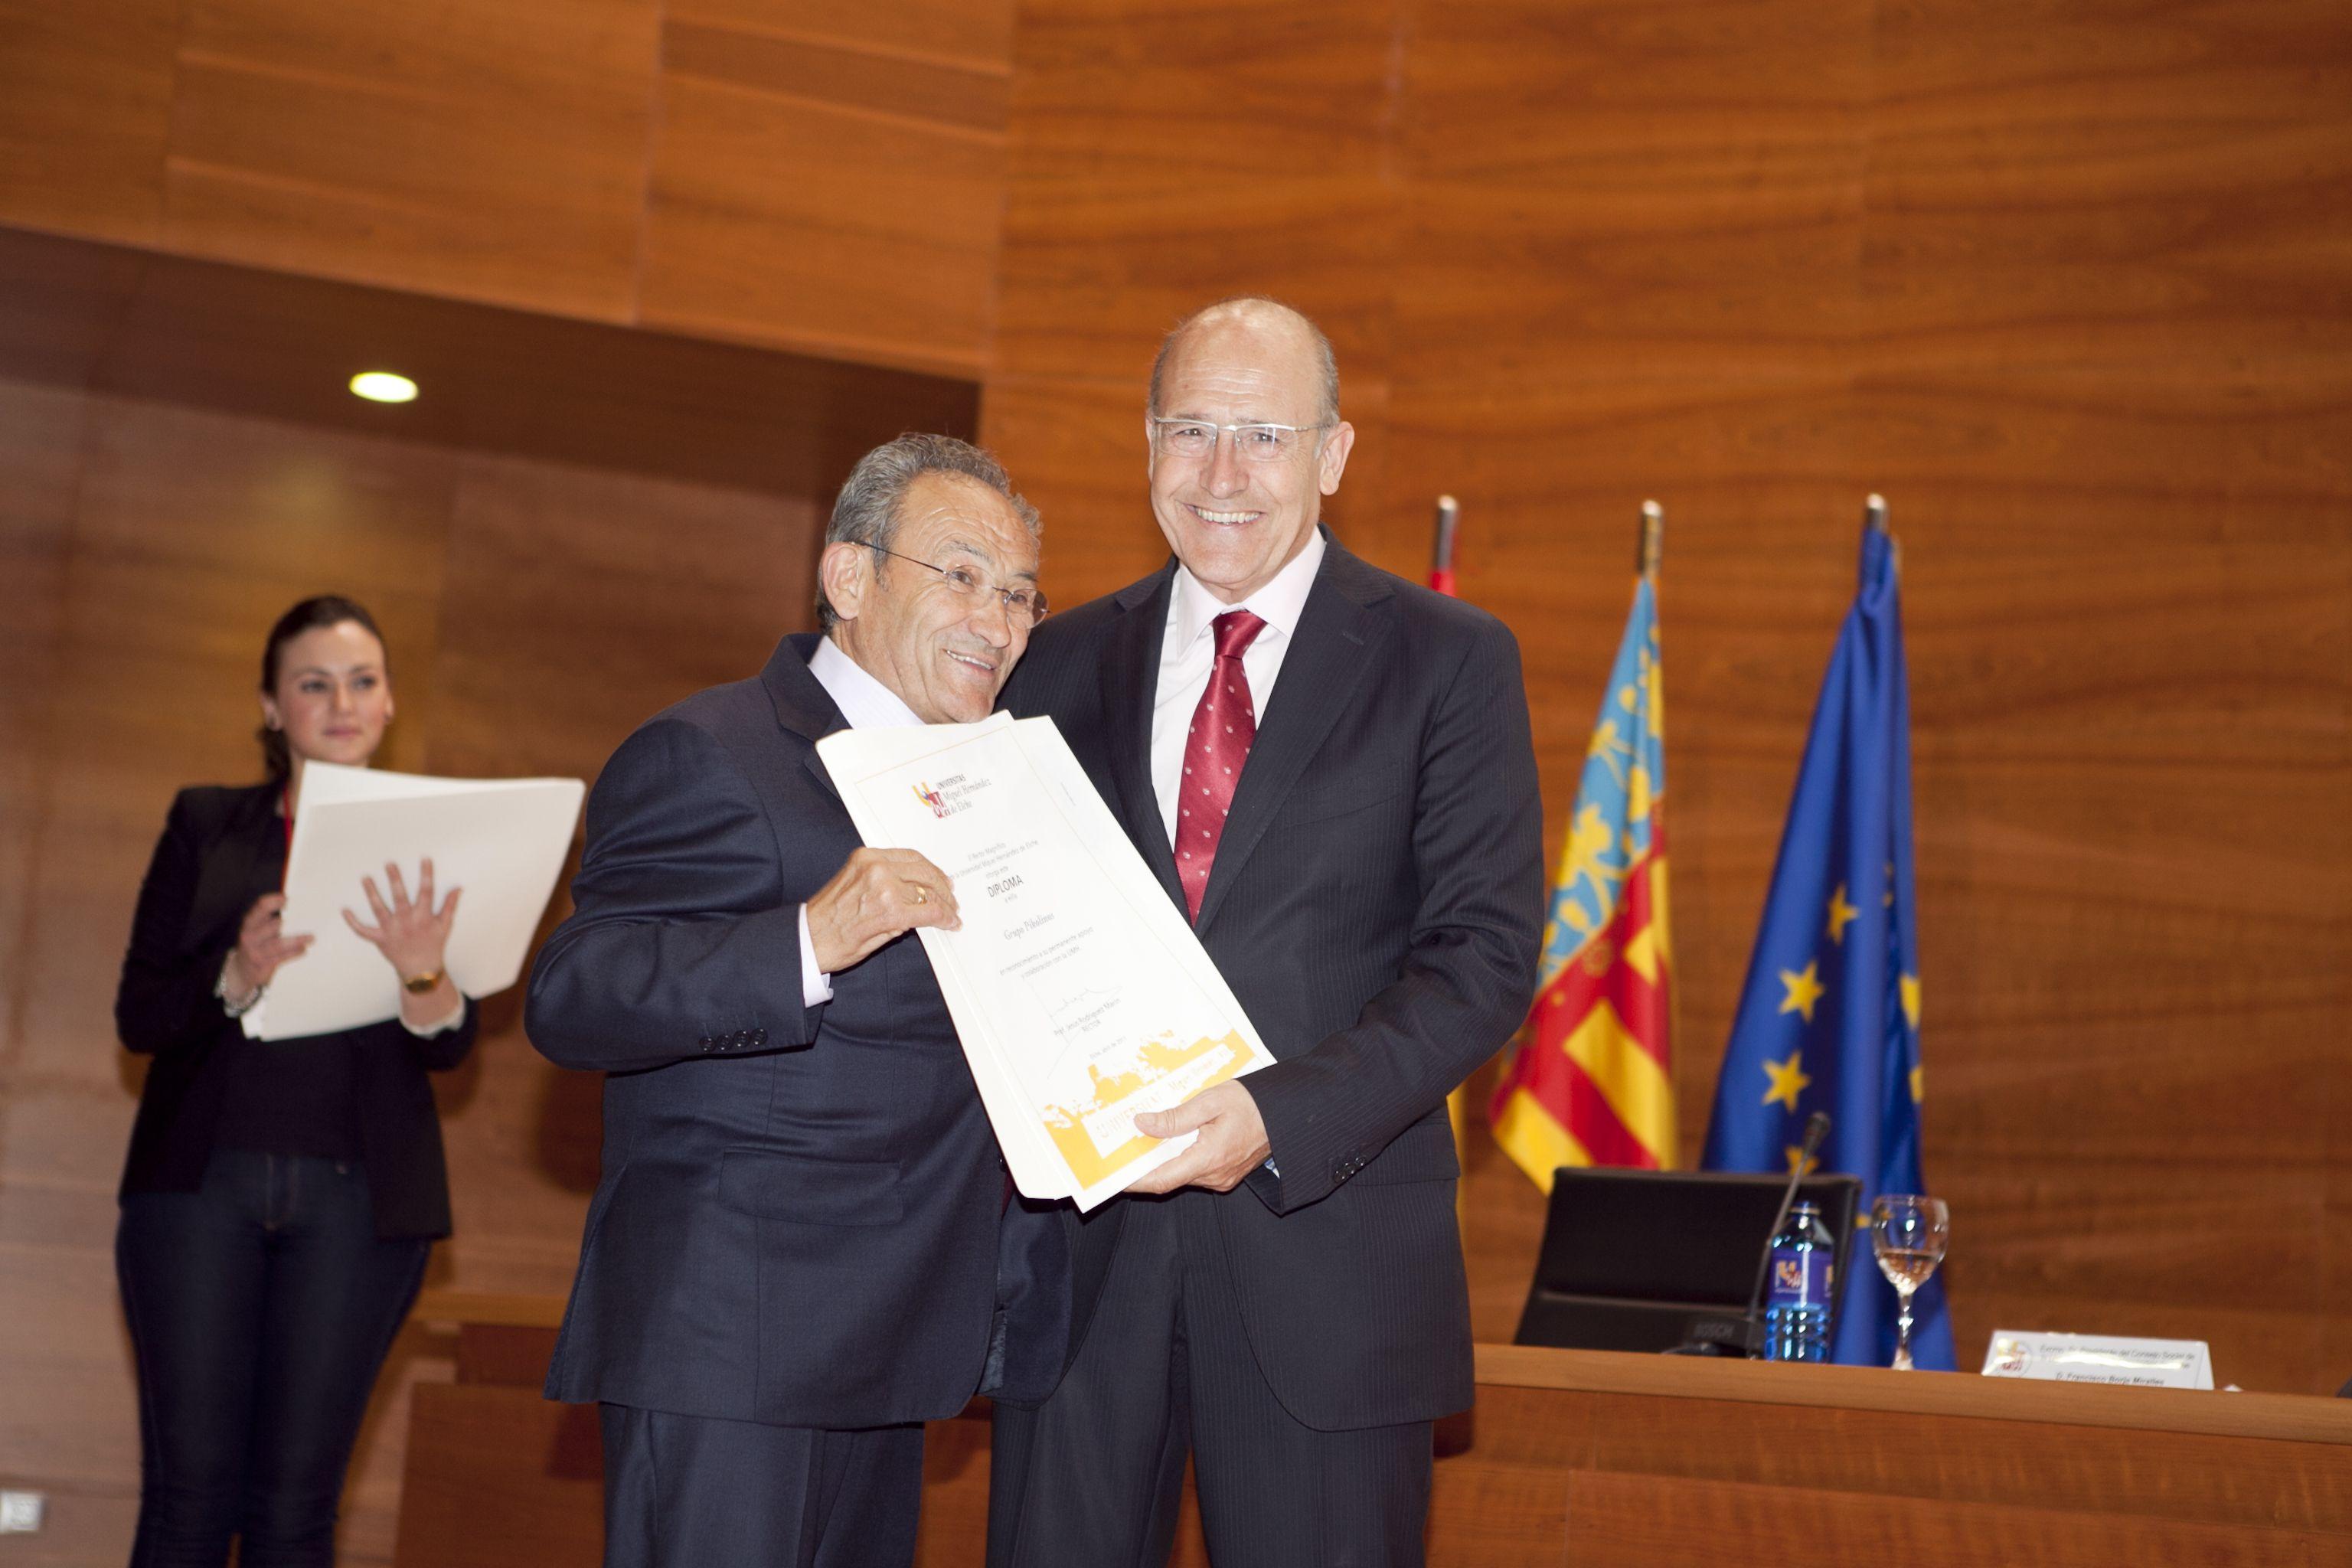 umh-diplomas-rector_mg_6758.jpg